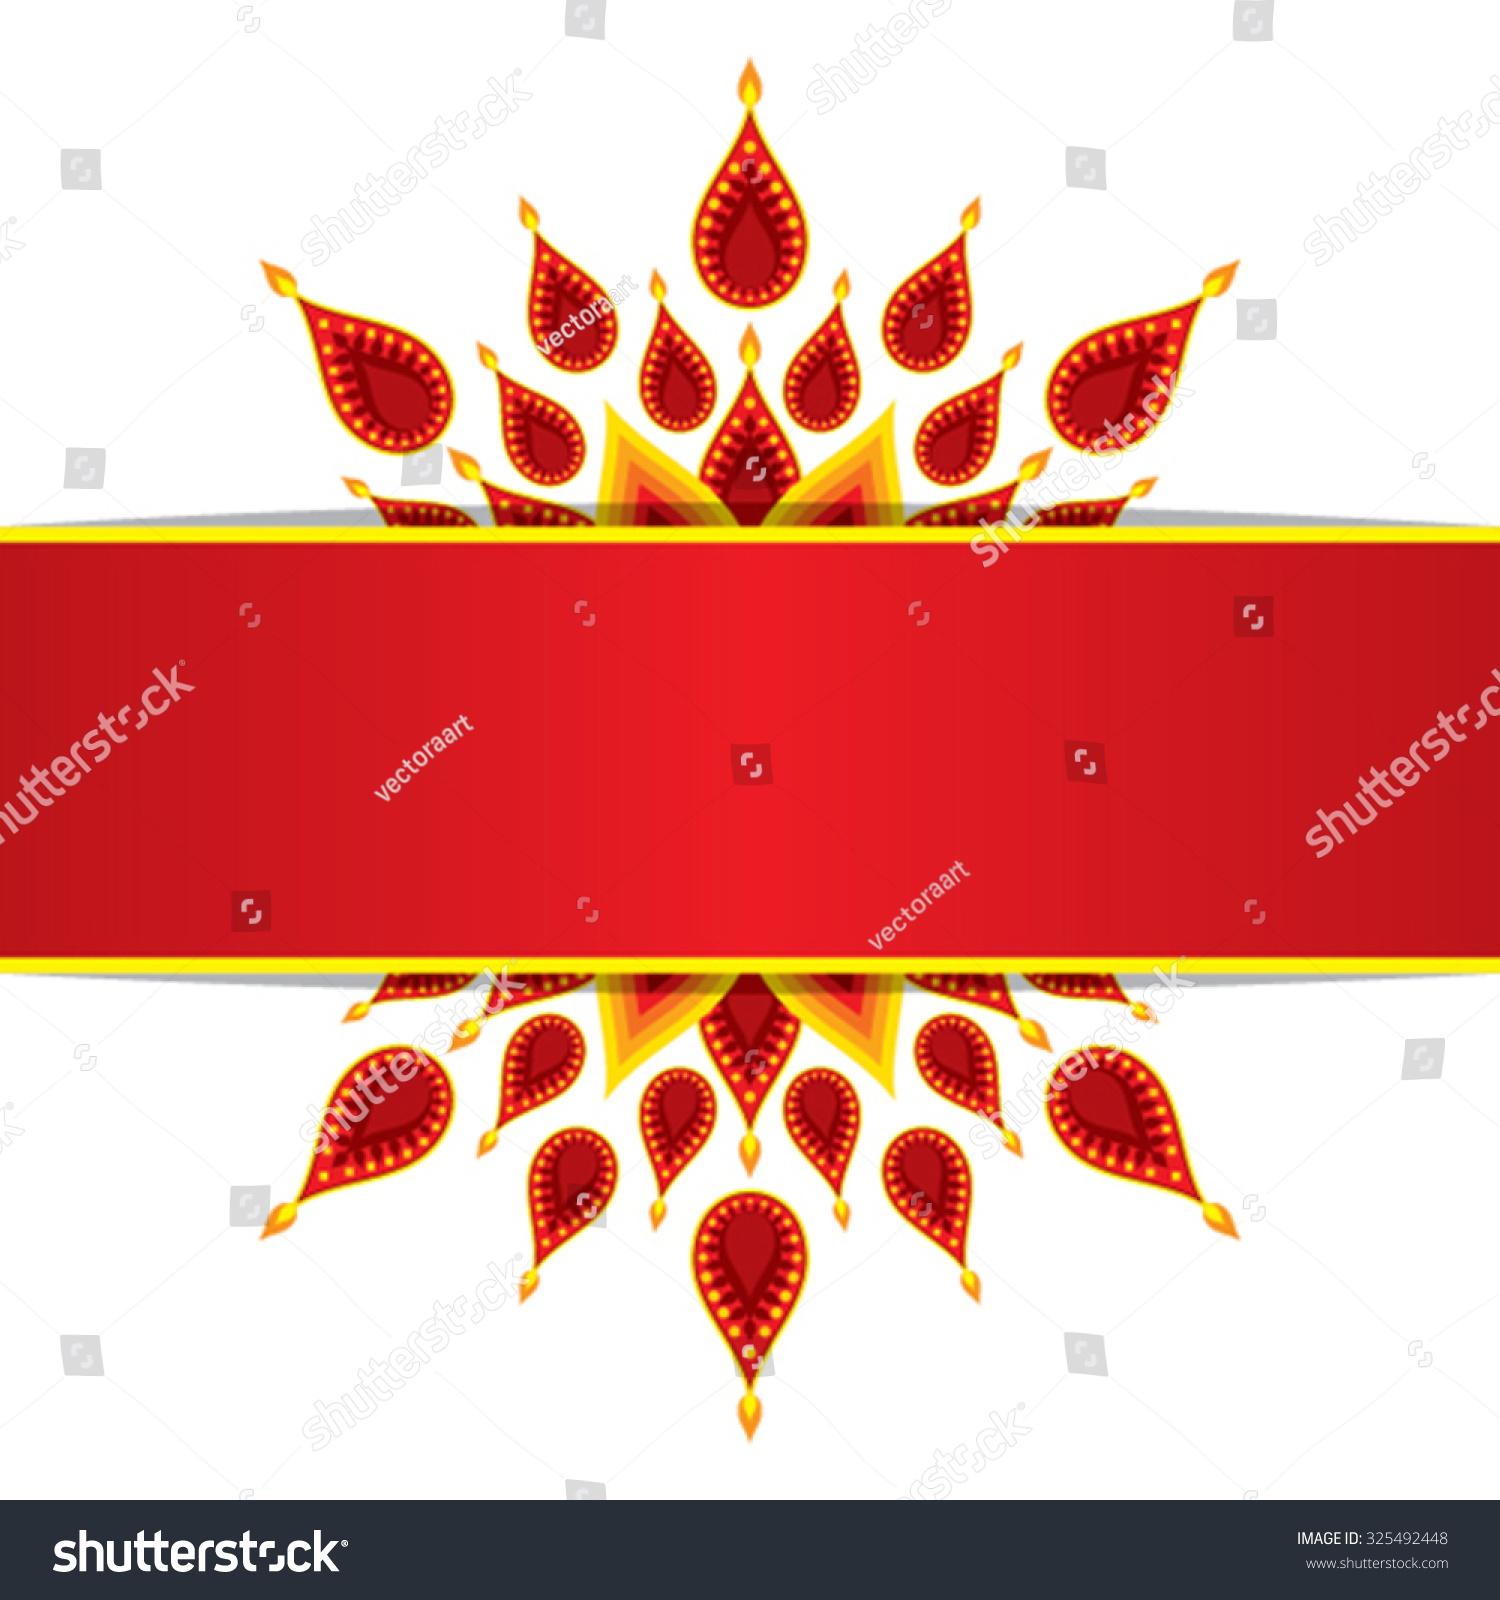 Creative happy diwali greeting card design stock vector royalty creative happy diwali greeting card design vector m4hsunfo